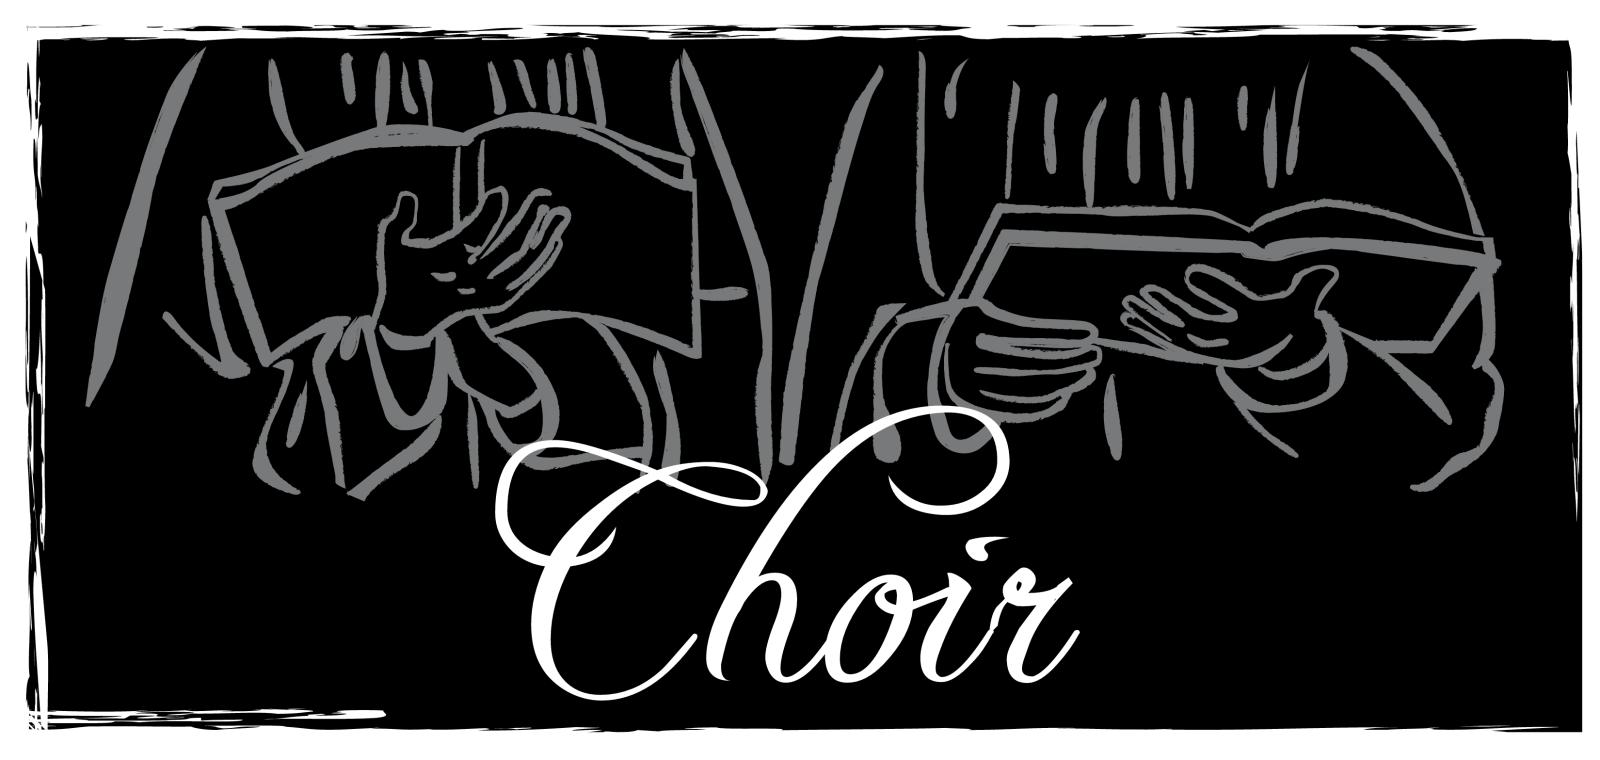 Choir Director Clipart.